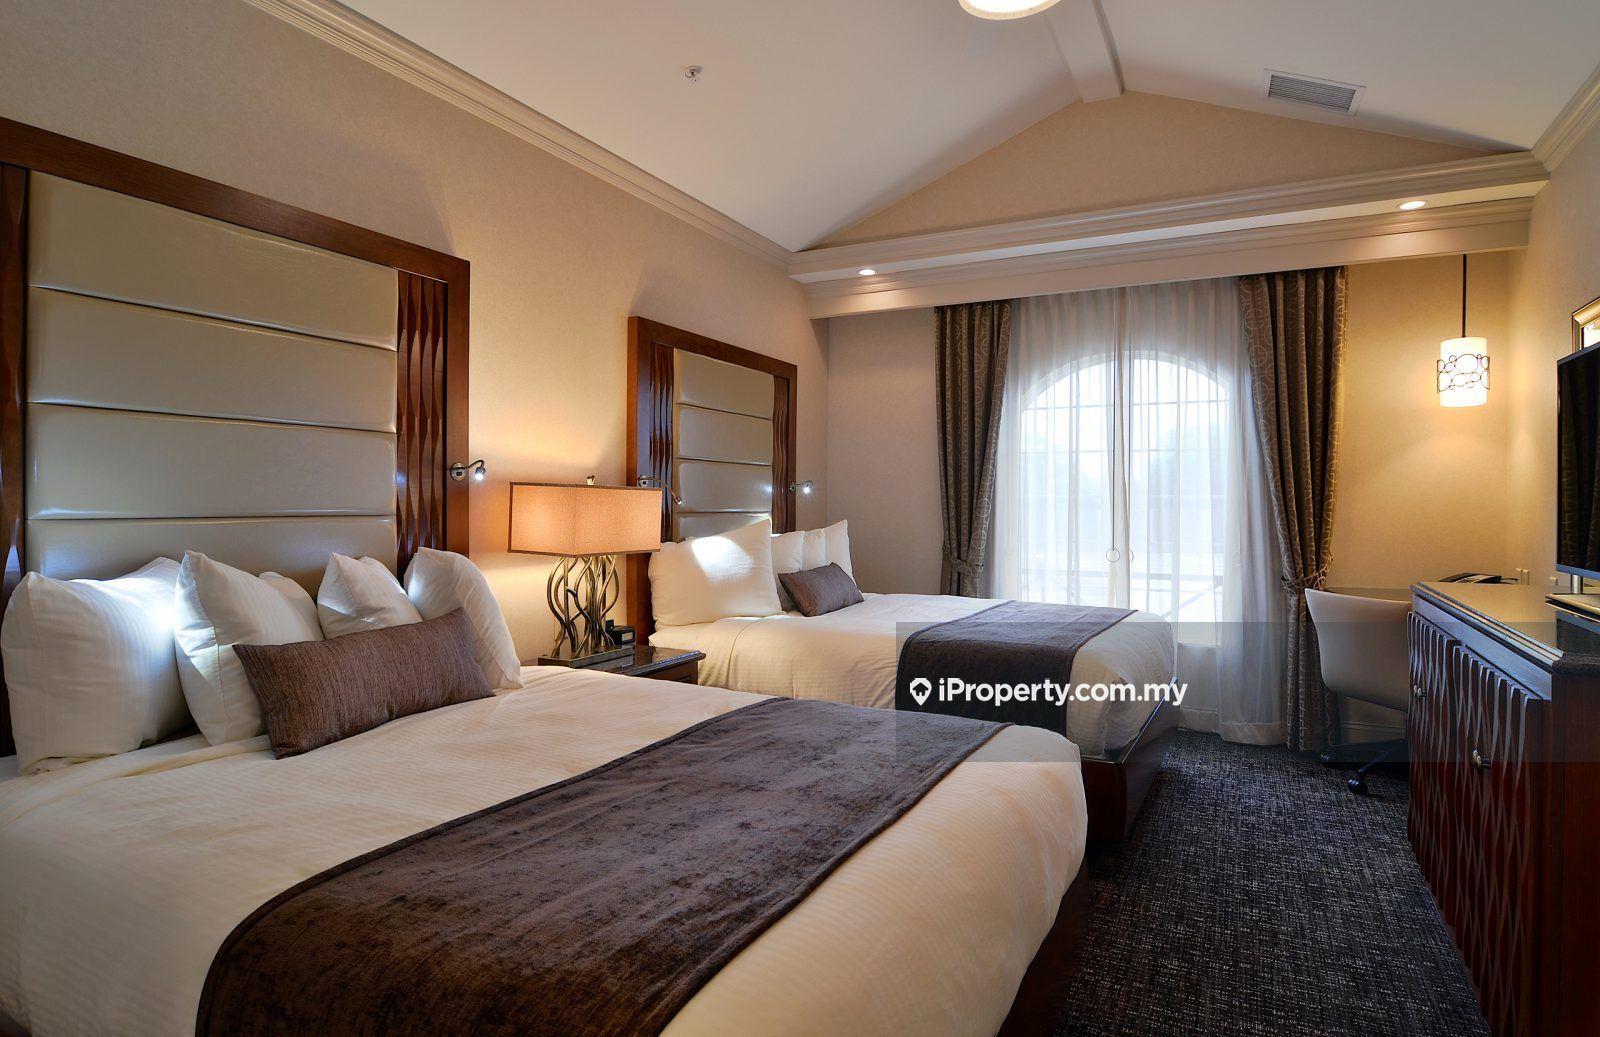 Good Deal: Highly Discounted Hotel at Bukit Bintang, Kuala Lumpur, Bukit Bintang